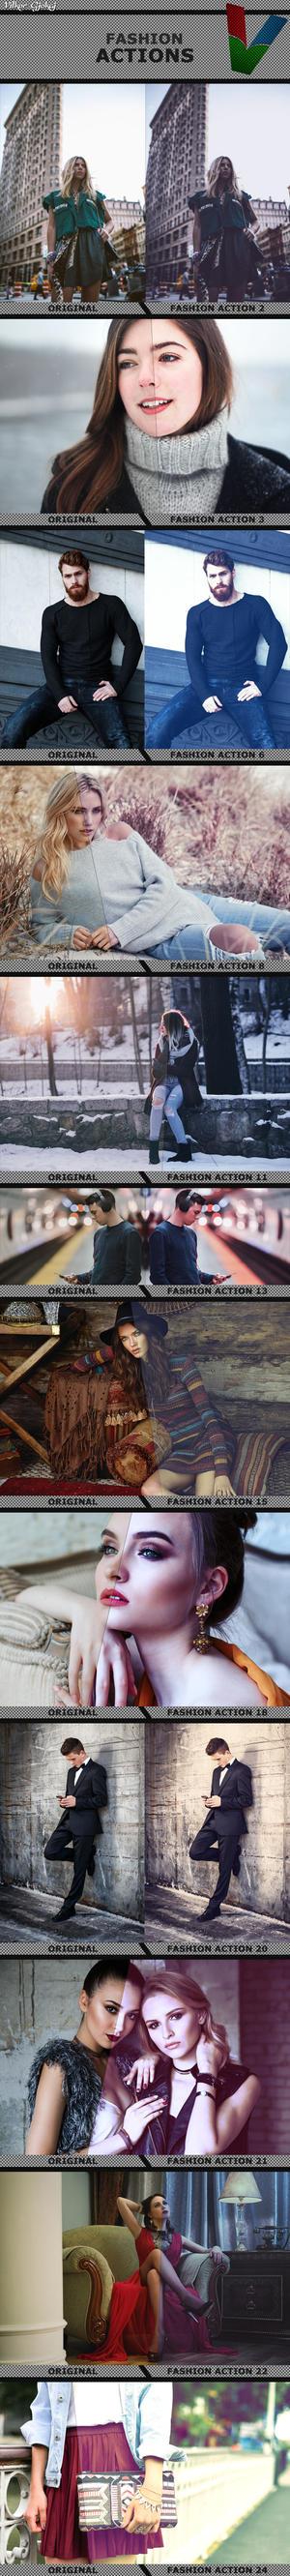 Fashion Actions by ViktorGjokaj